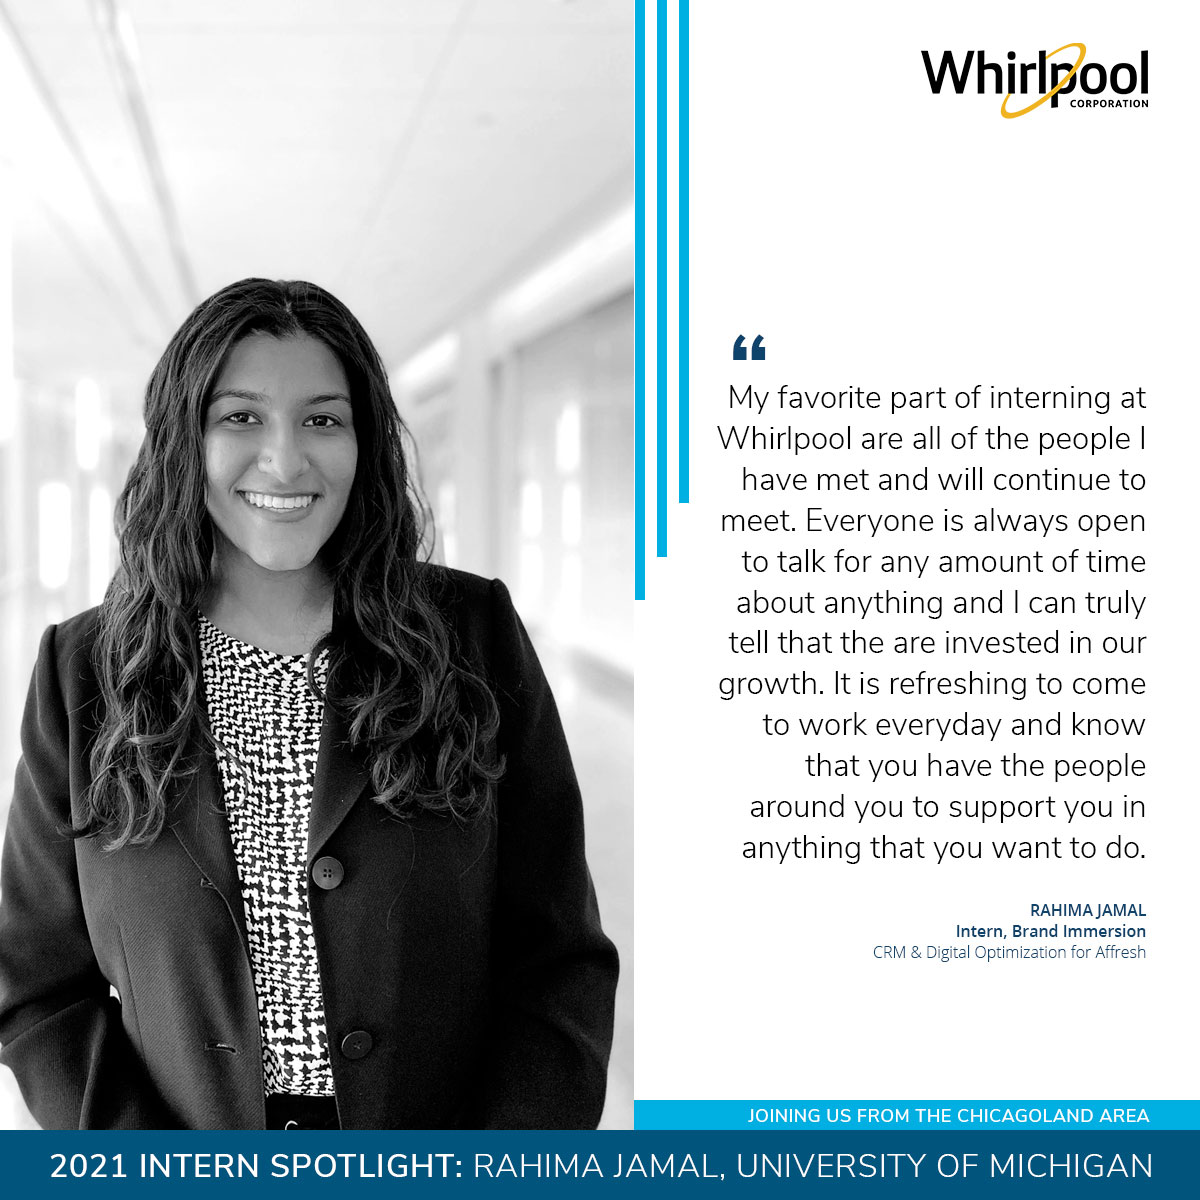 2021 Whirlpool Intern Rahima Jamal from University of Michigan